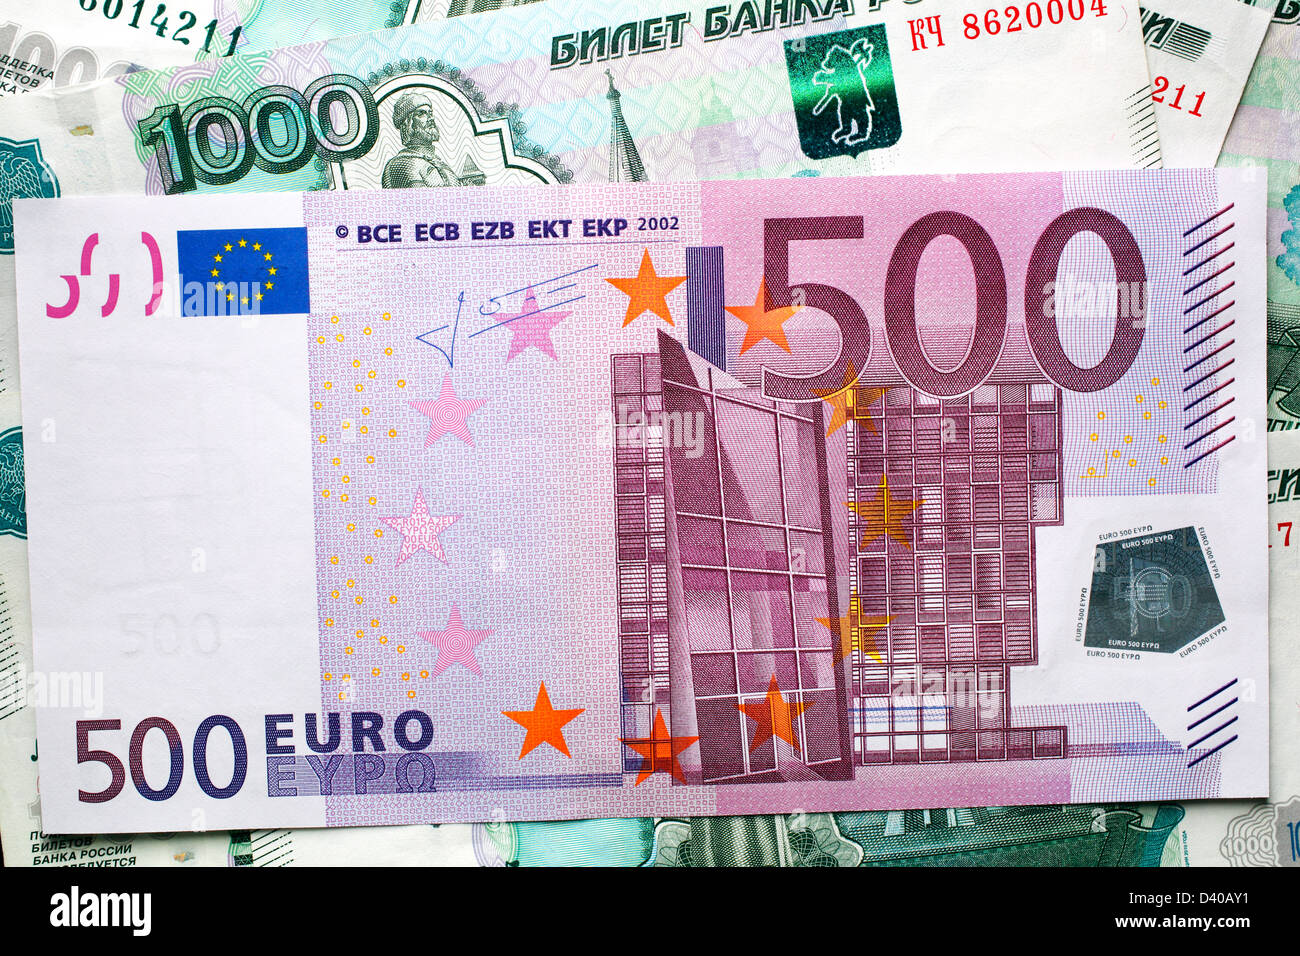 500 евро на рубли фунты стерлингов курс к рублю